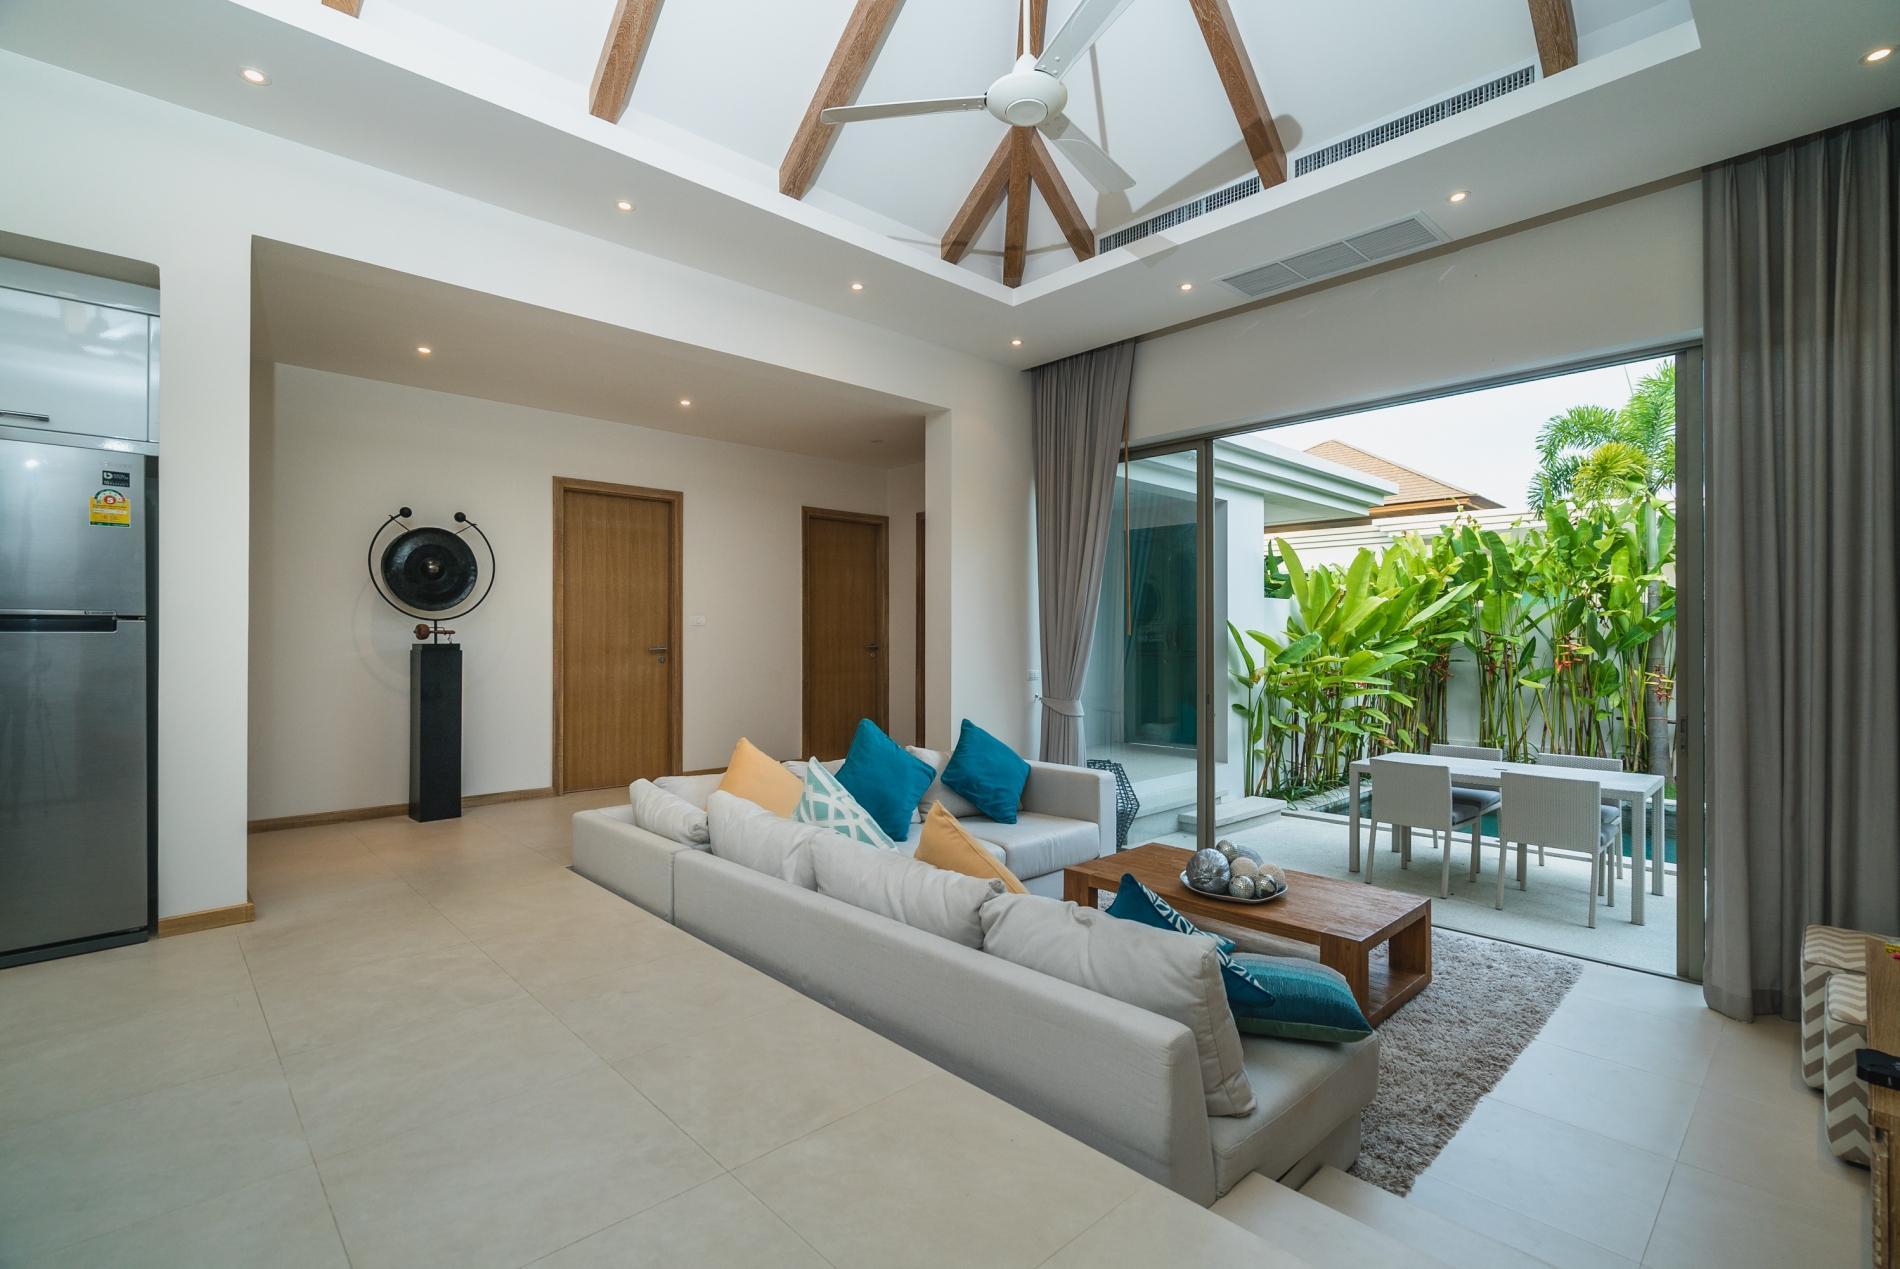 Apartment Trichada 18 - Private pool modern 3 bedroom villa photo 18789372